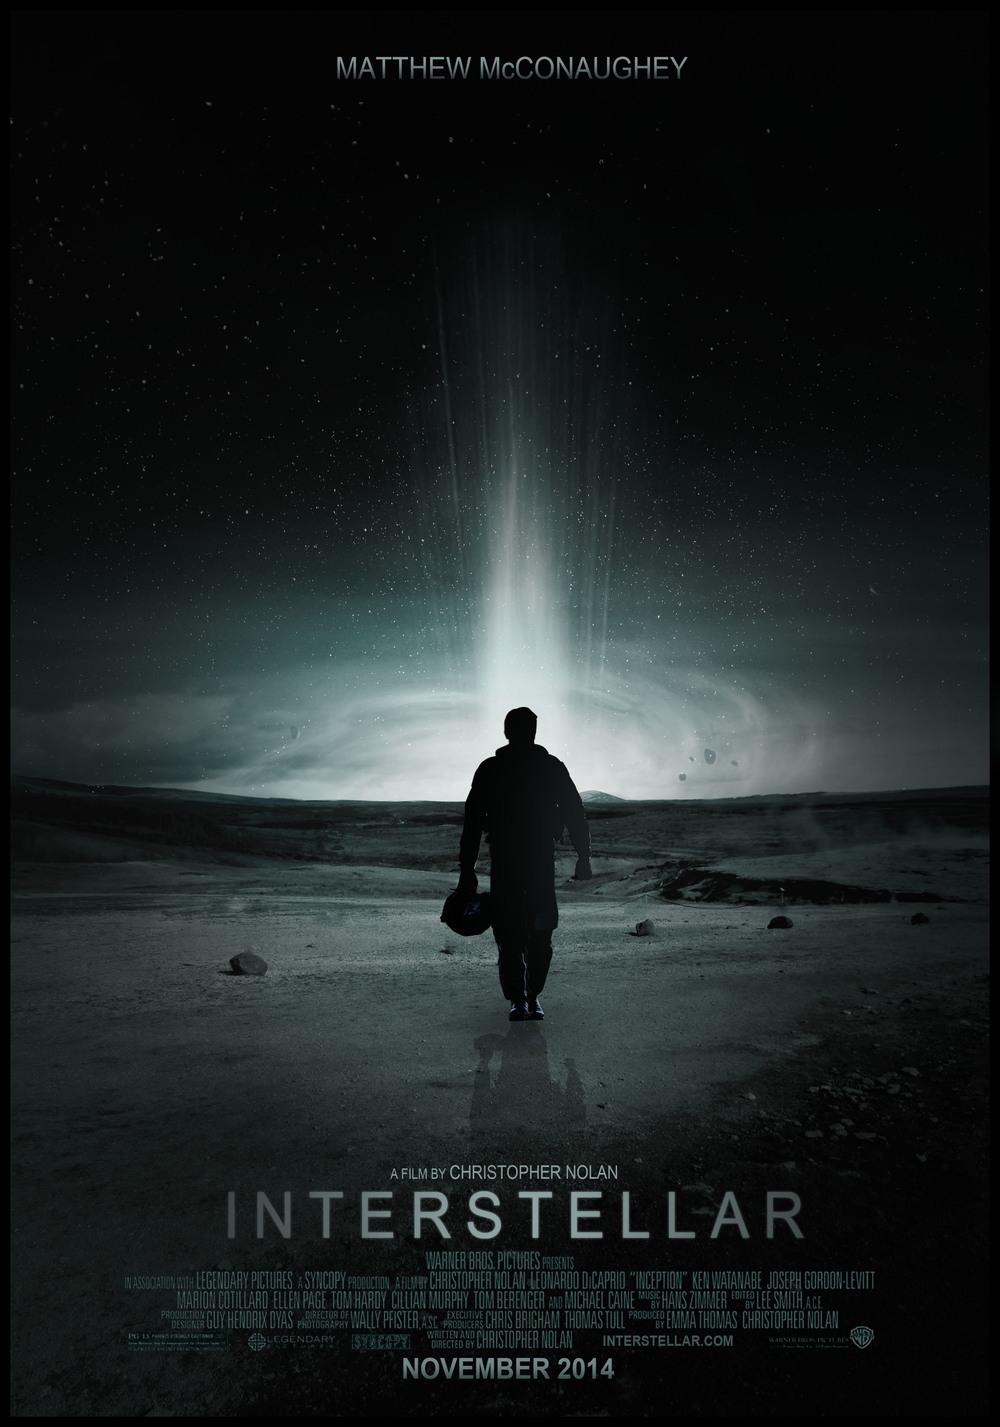 interstellar cult projections